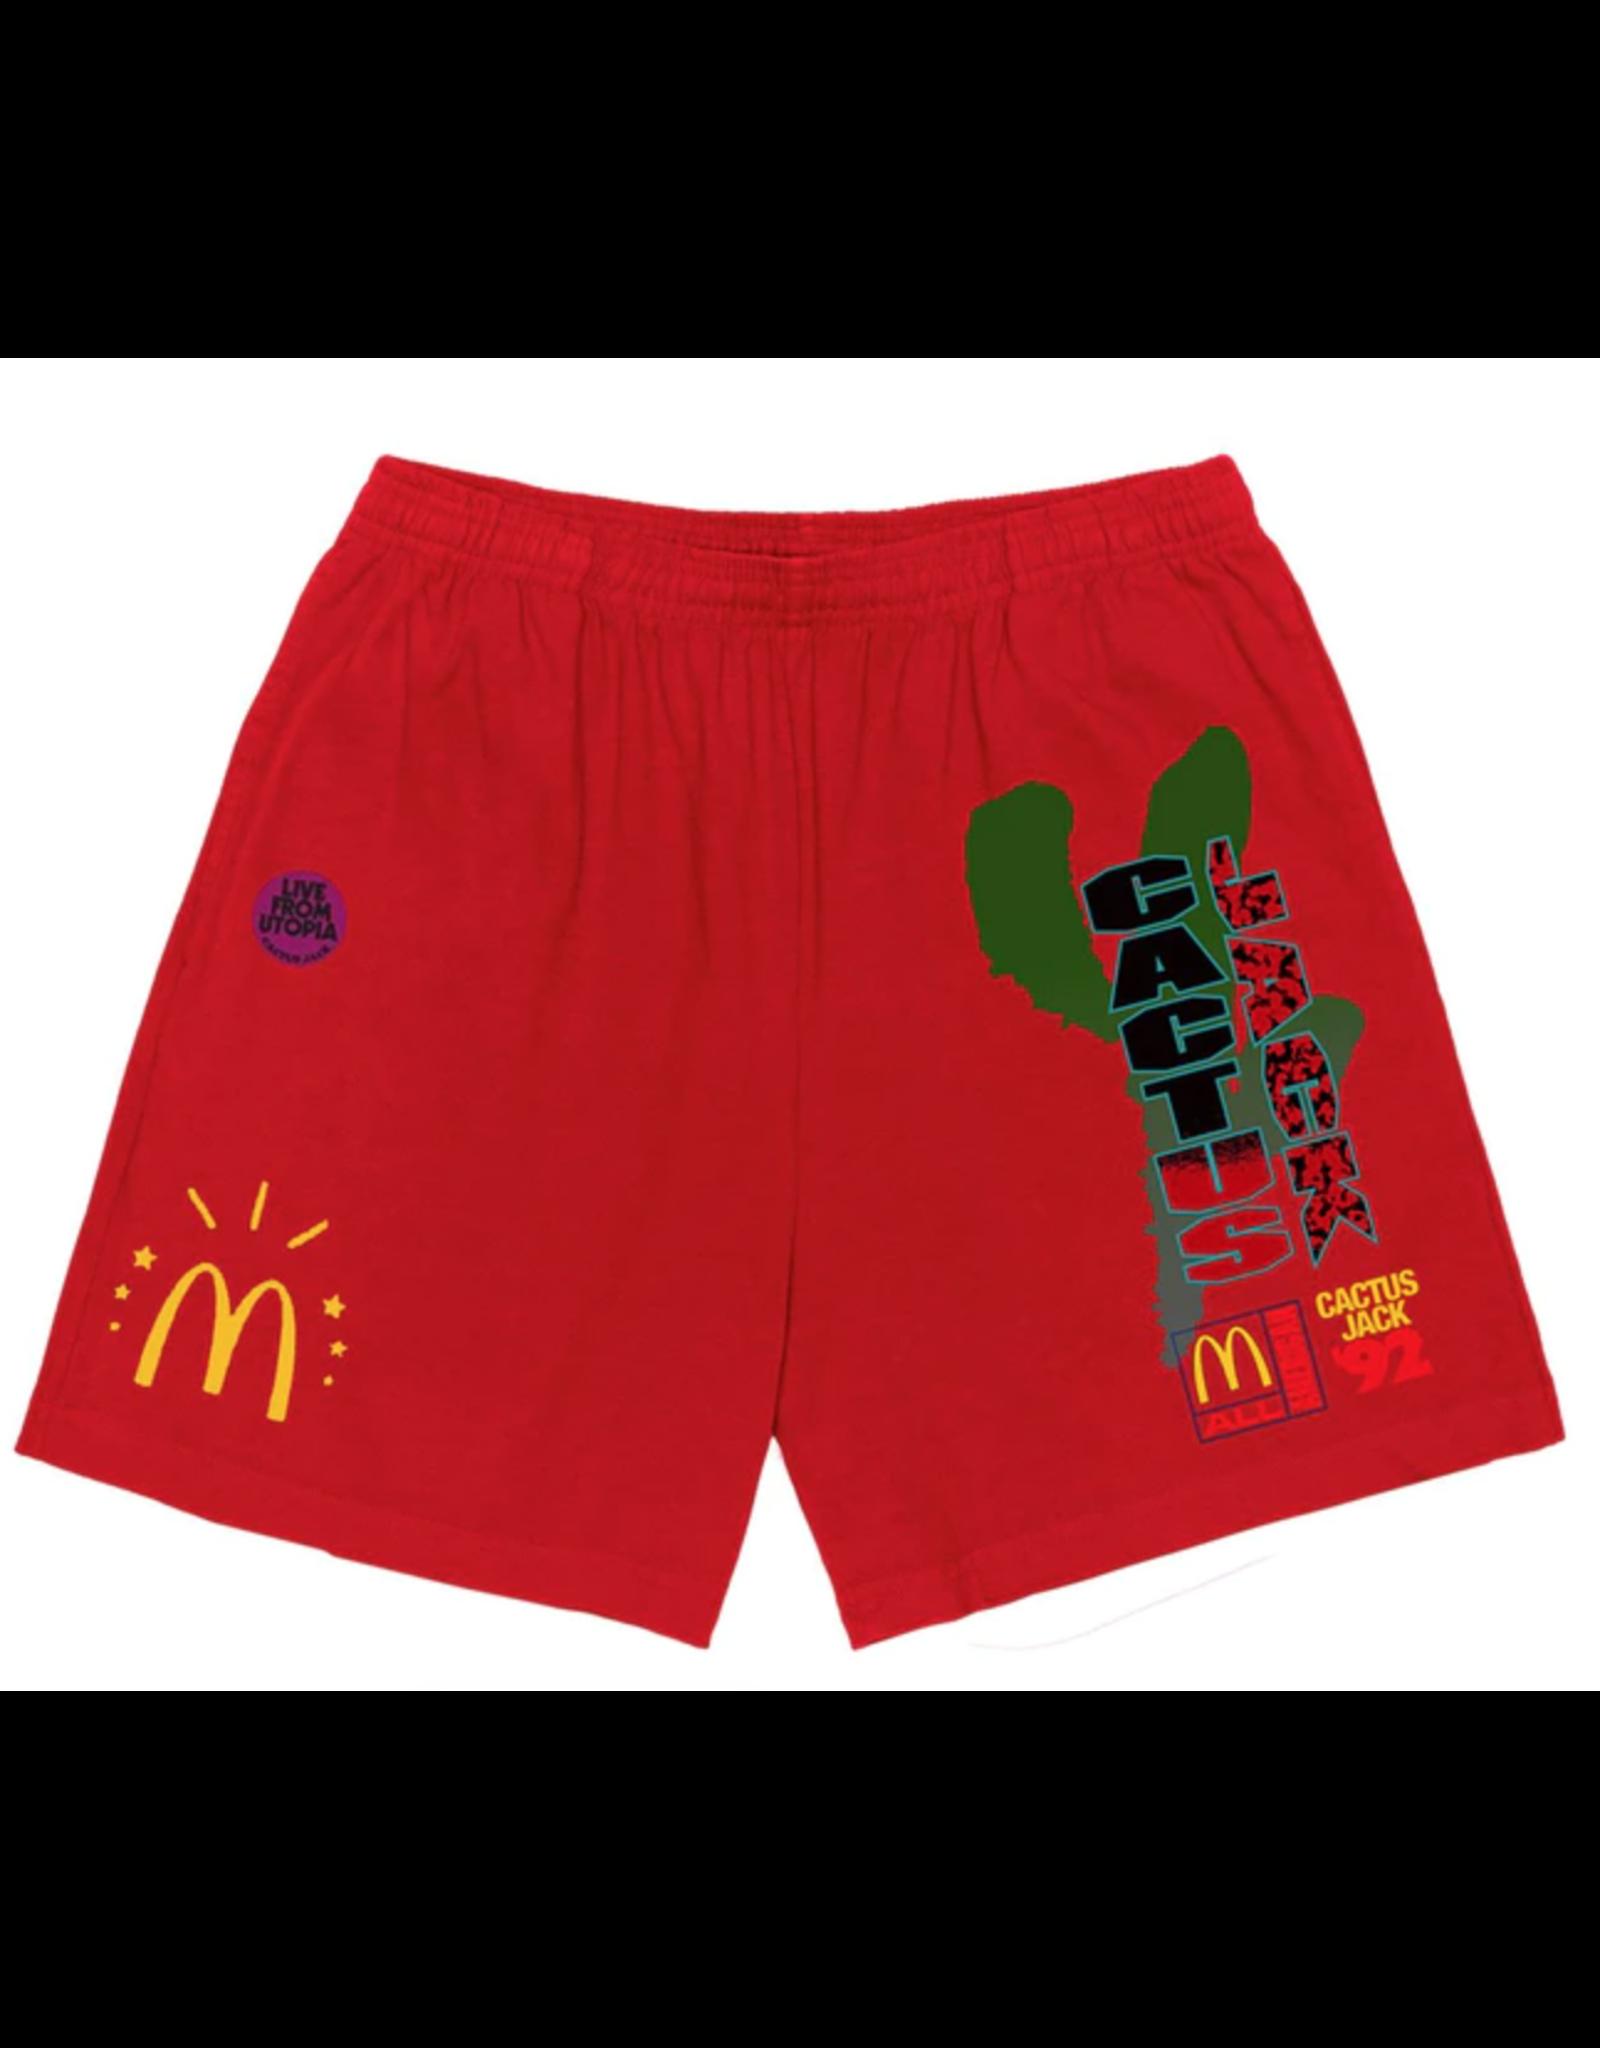 Travis Scott x McDonald's All American '92 Shorts Red